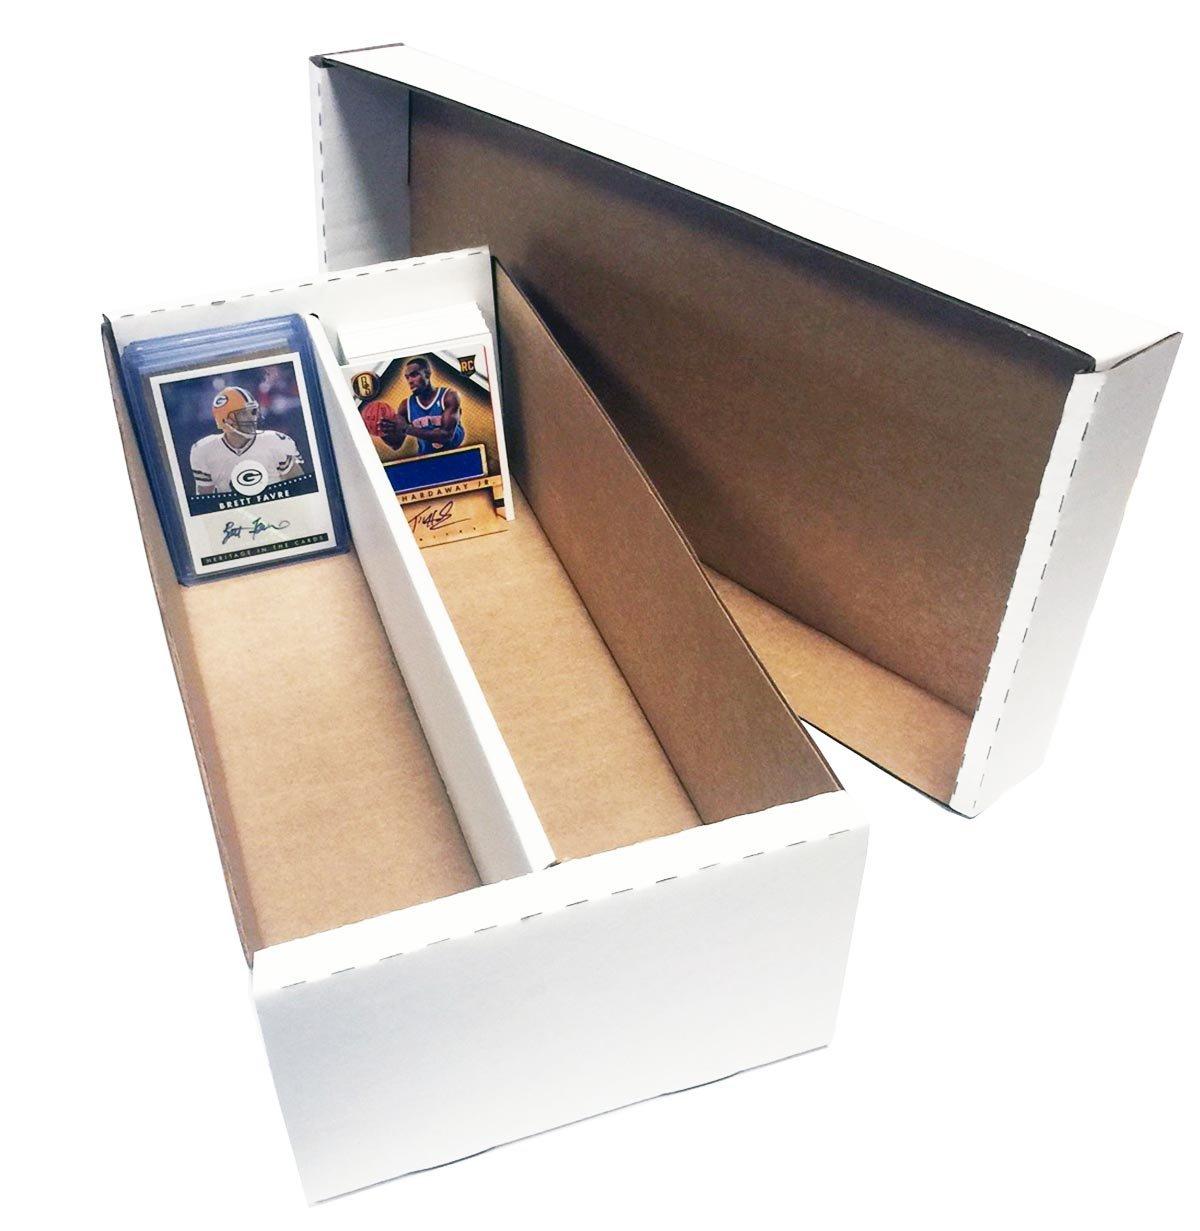 Baseball,Football Nascar SUPER Shoe 3-Row Storage Box 3000 Ct. - Corrugated Cardboard Storage Box 4 Sportscards Hockey Basketball Gaming /& Trading Cards Collecting Supplies by MAX PRO